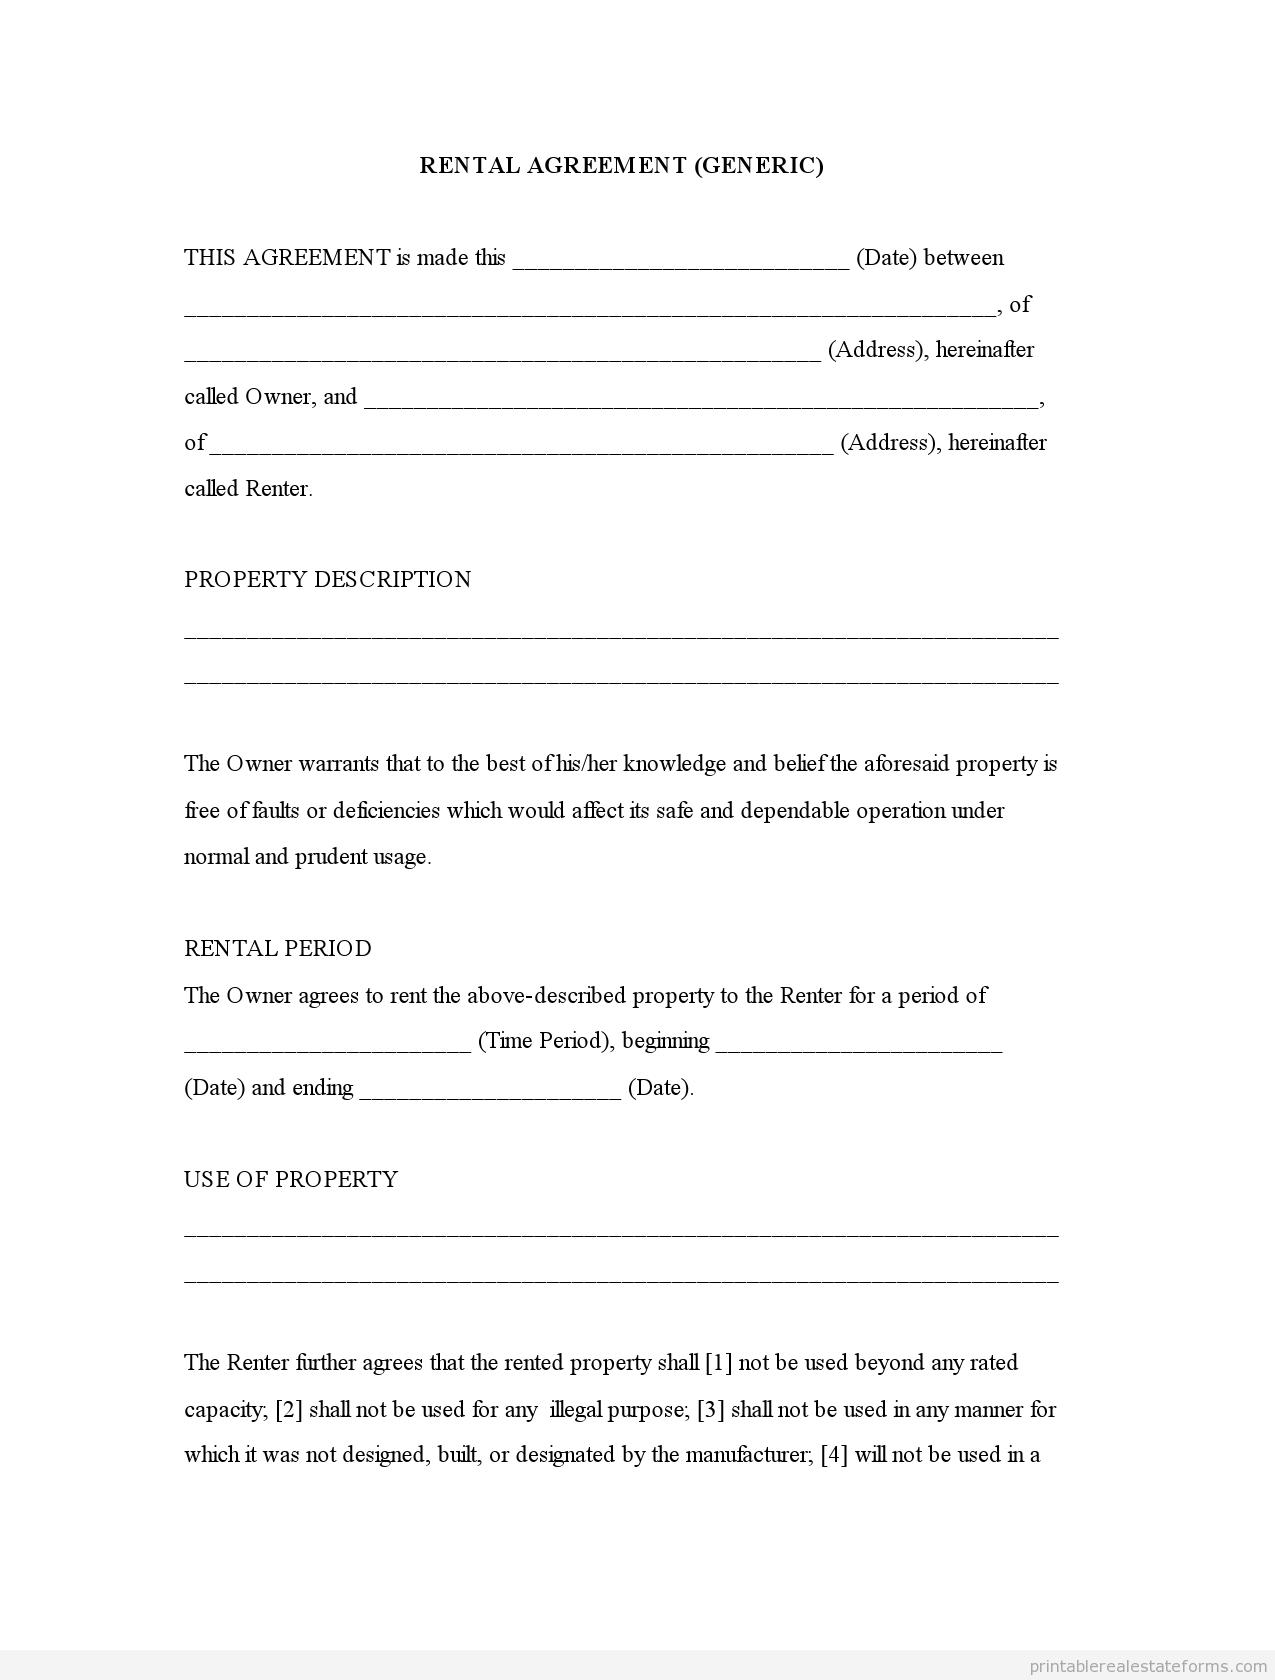 Simple Printable Rental Agreement Form Universal Network